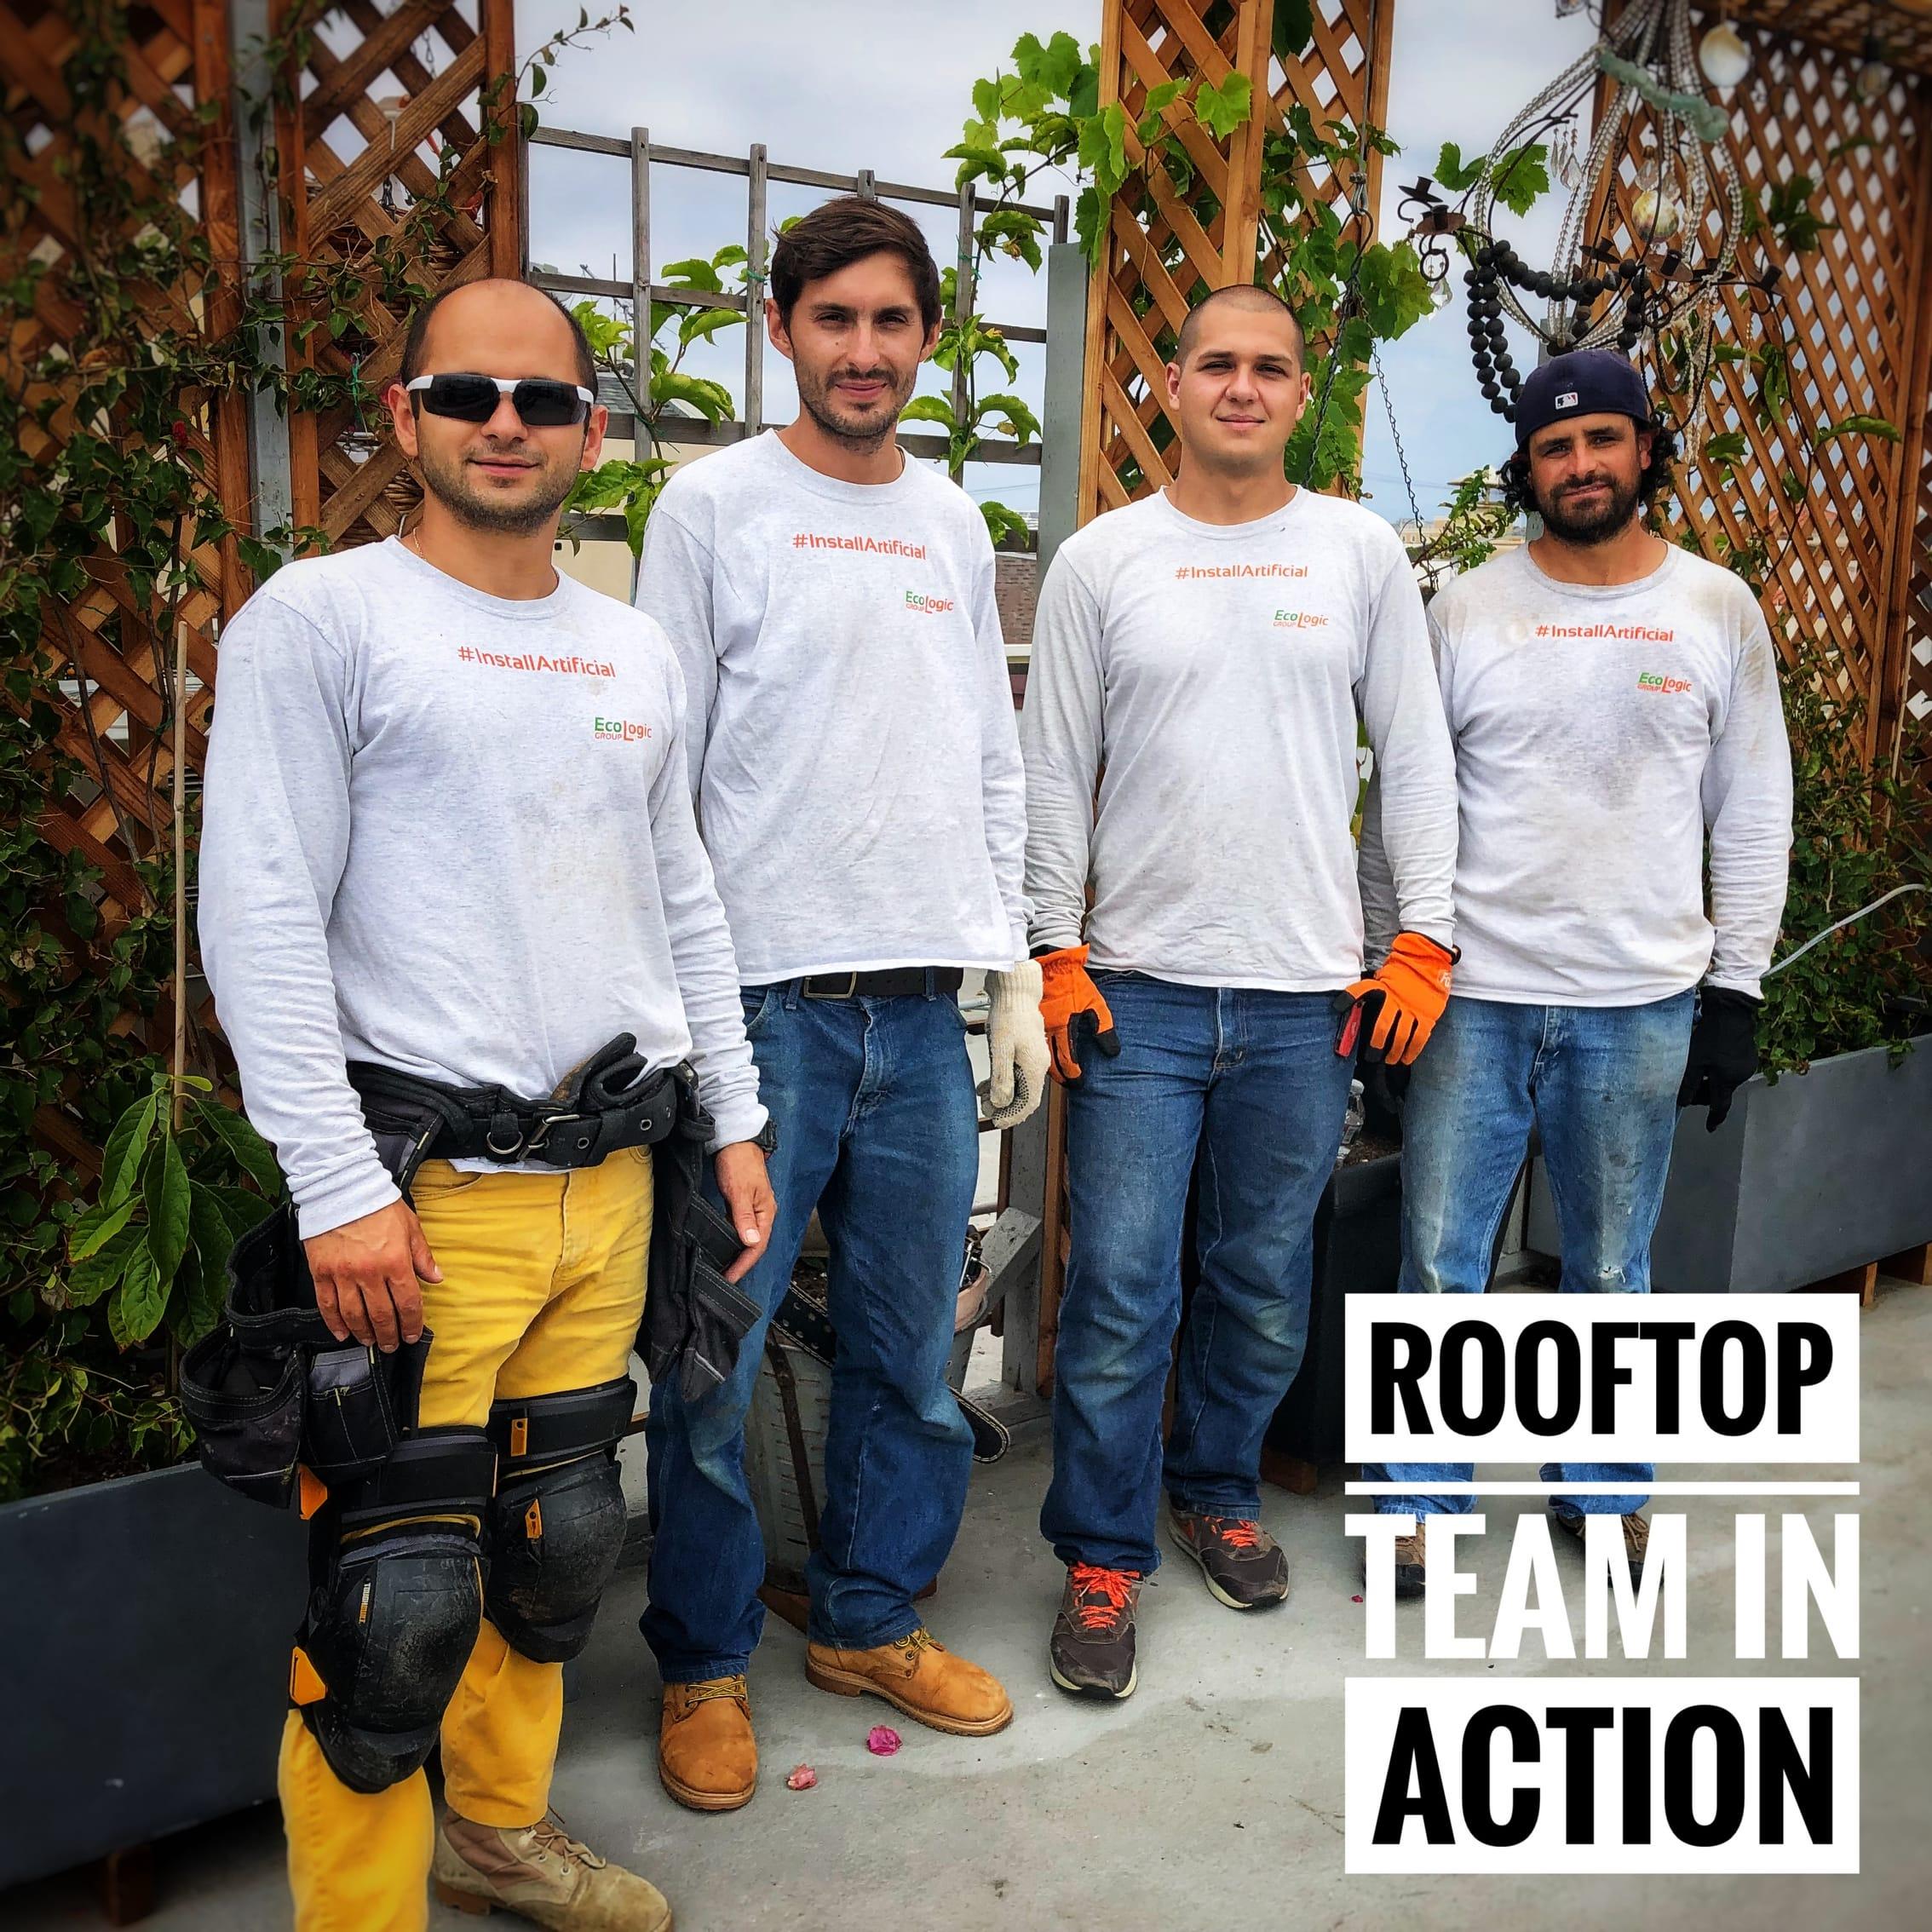 rooftop crew in action